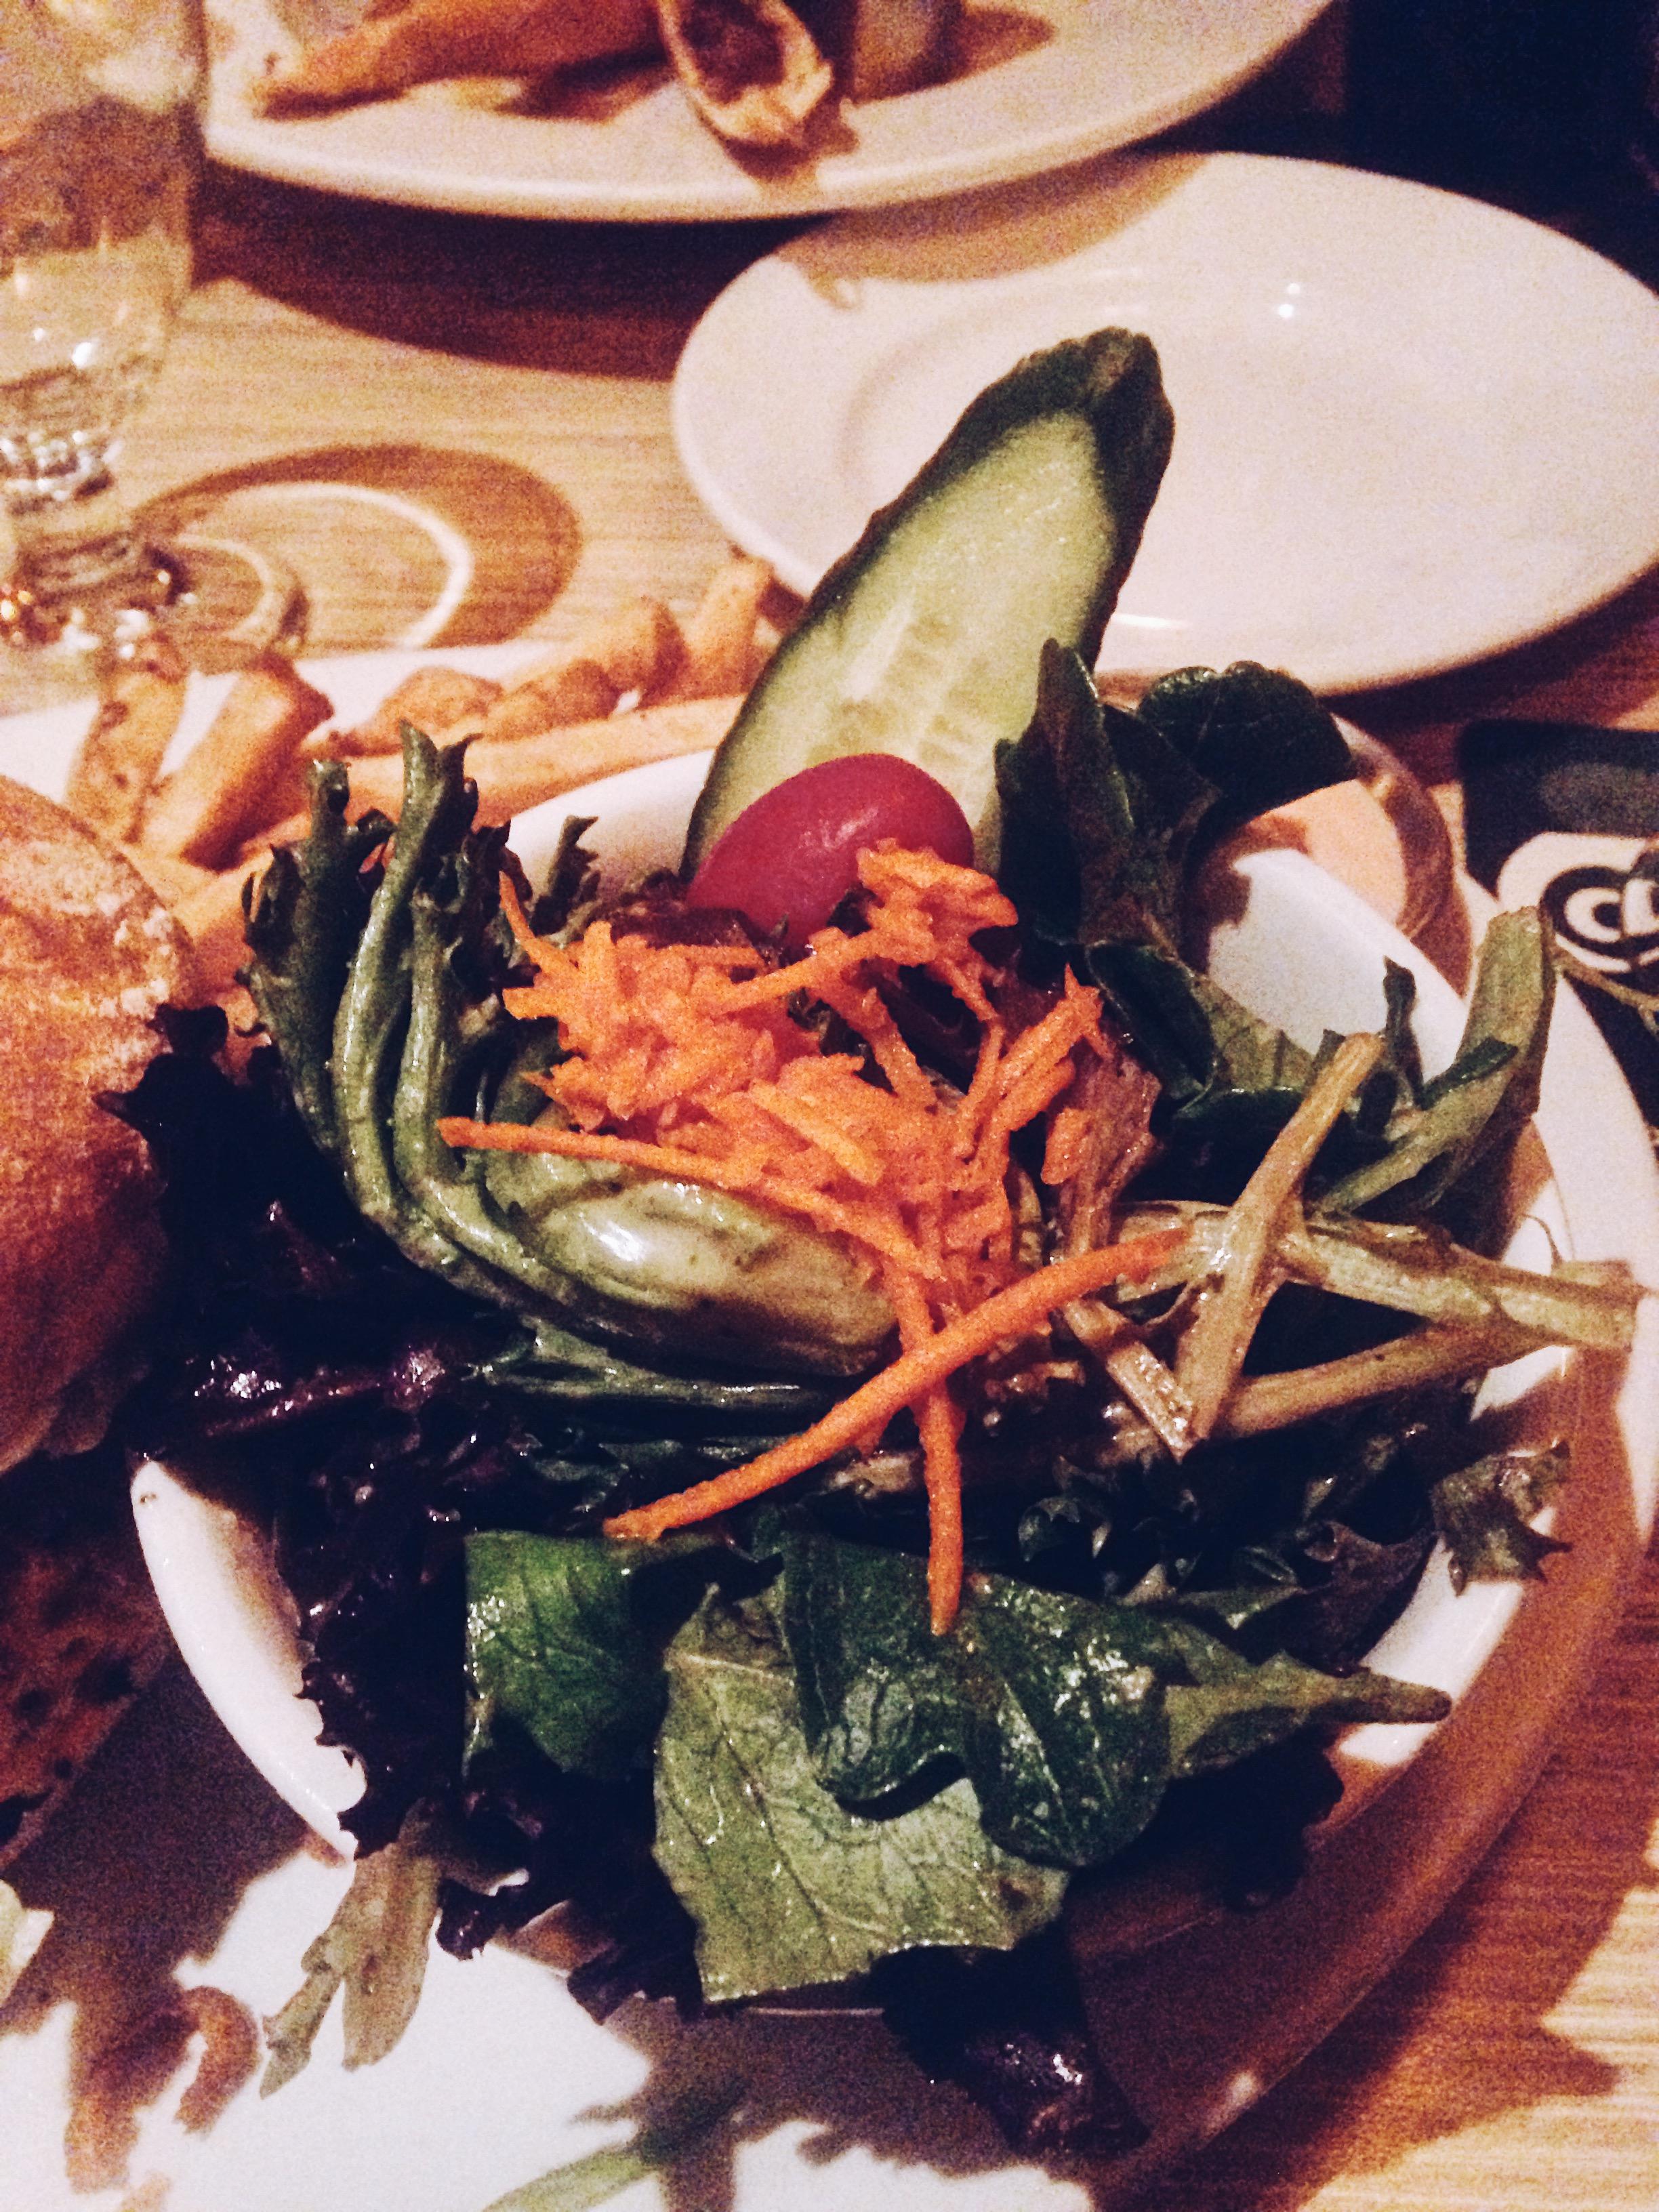 Veggie burgers at Biercraft. Vancouver. Canada. Restaurant Review